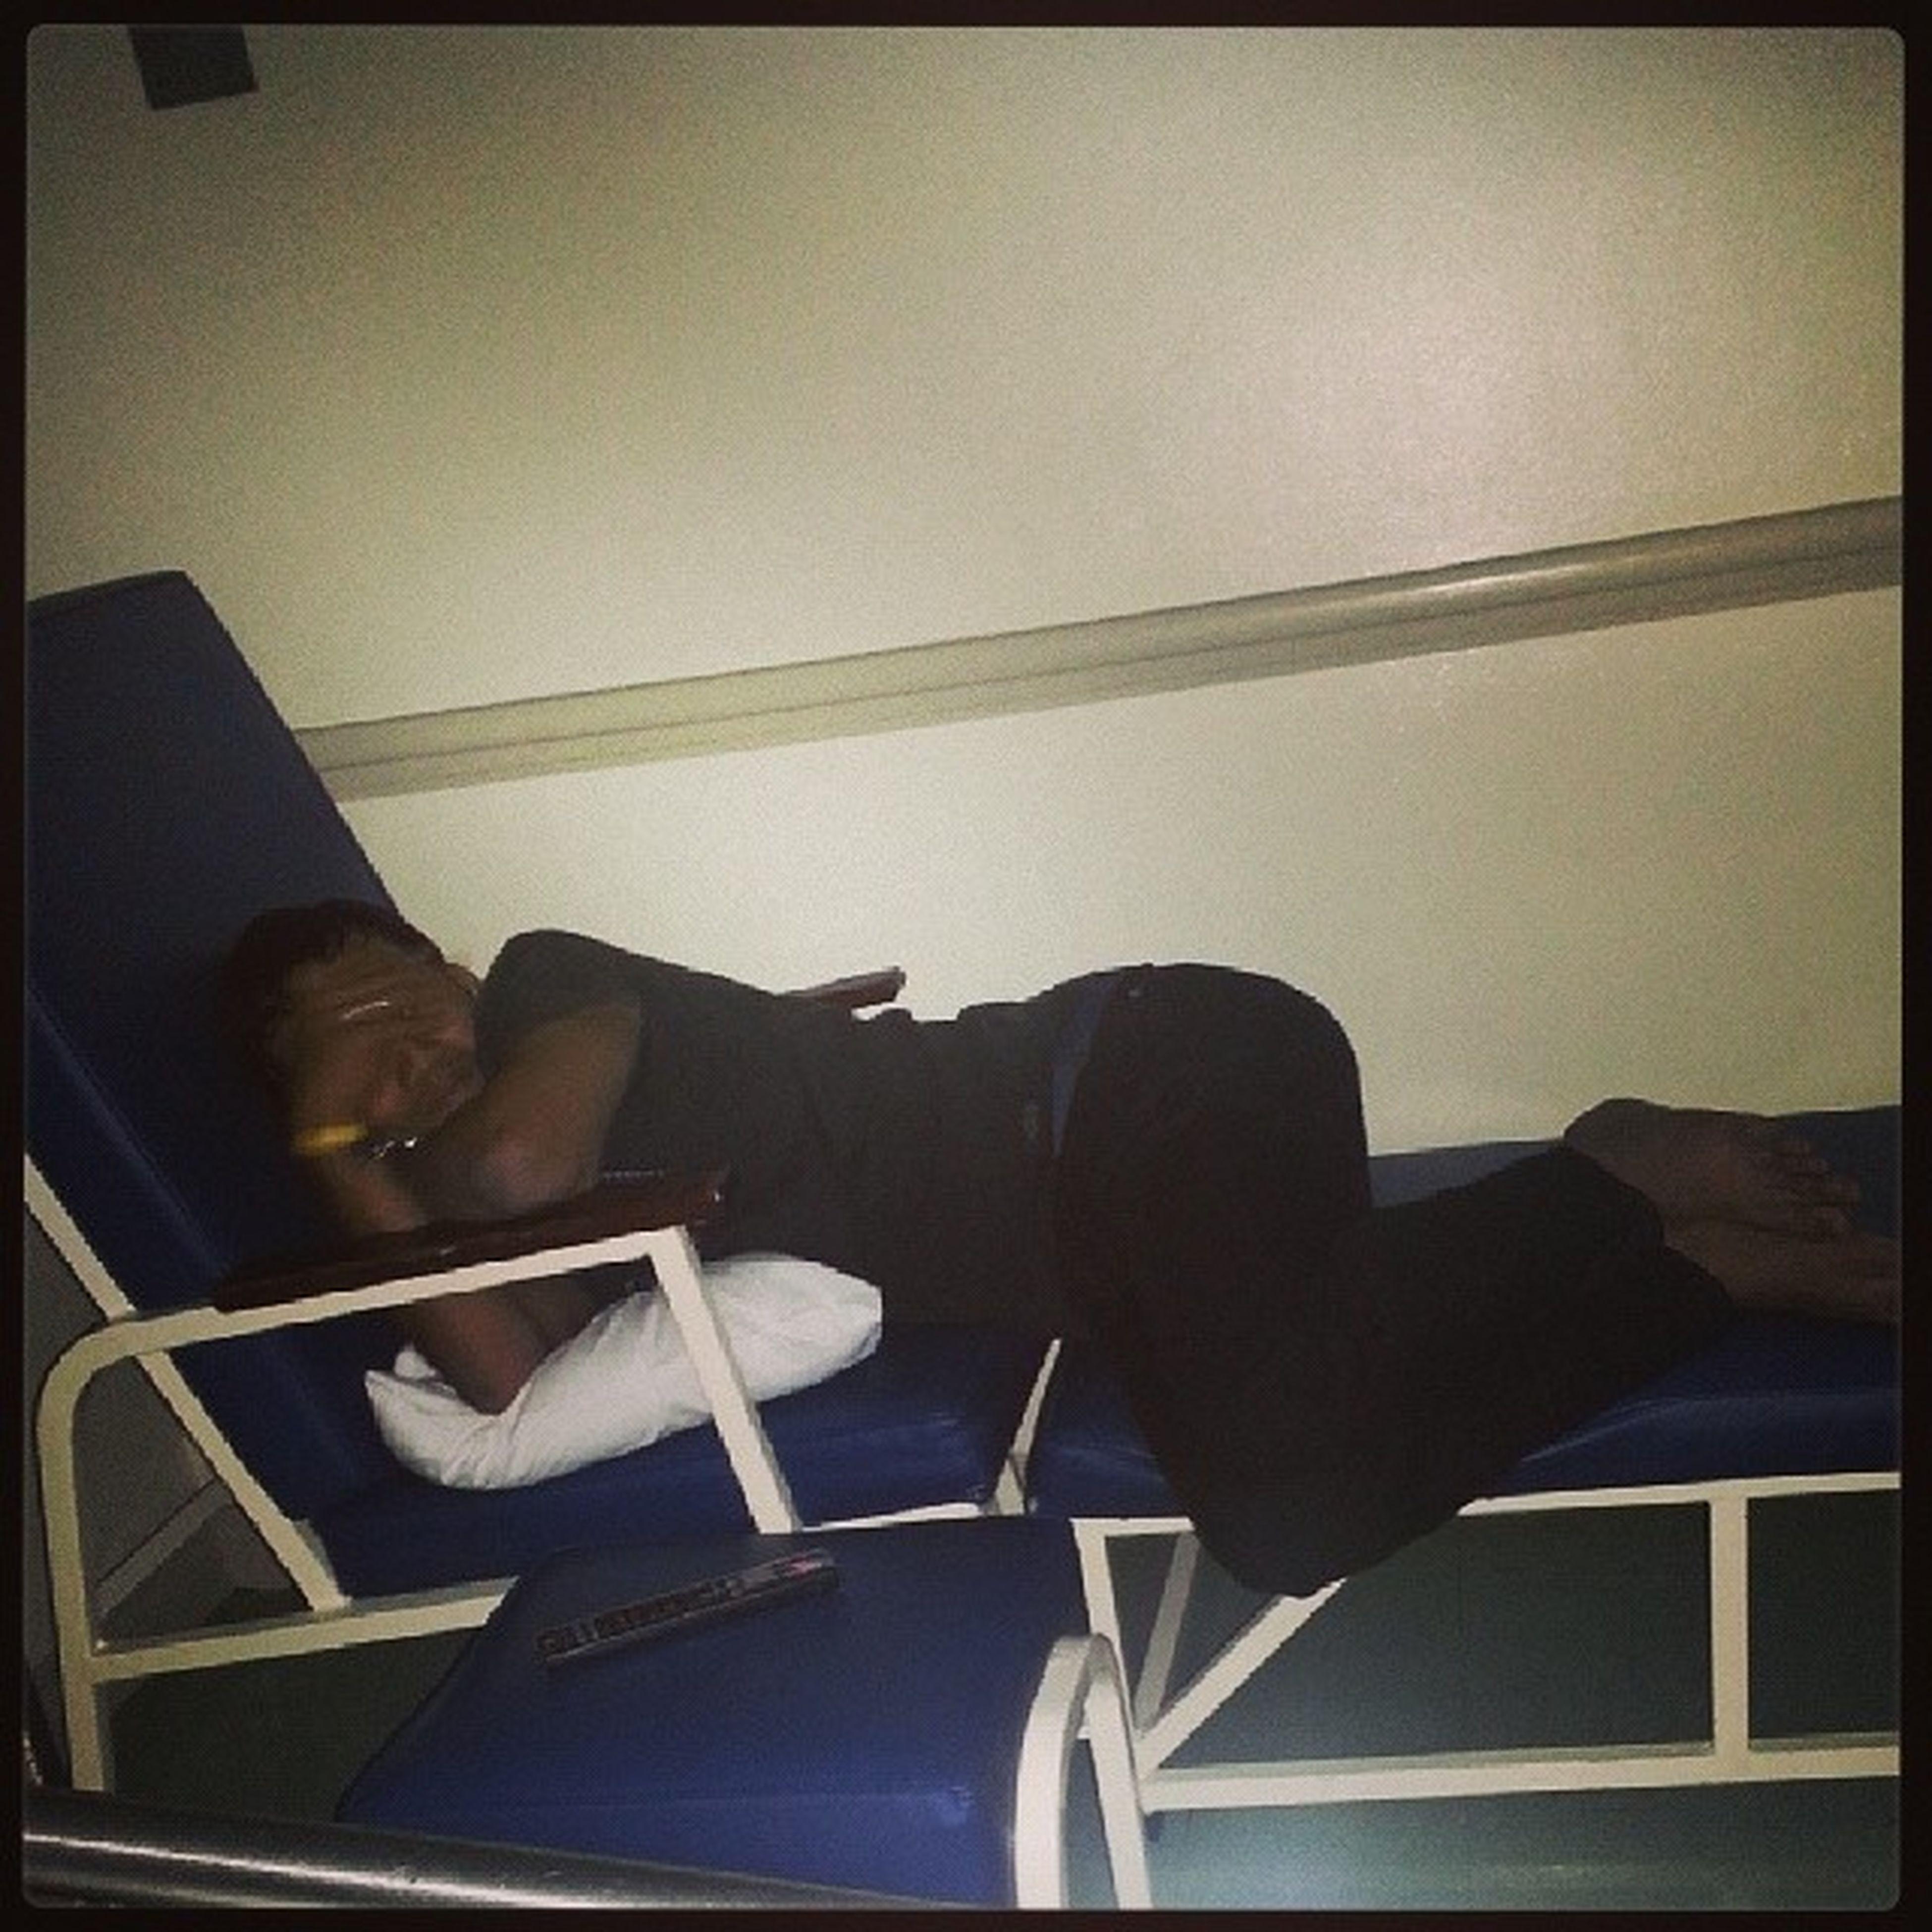 My superman is super bored already, watching WWE. Hospital Goinghometom